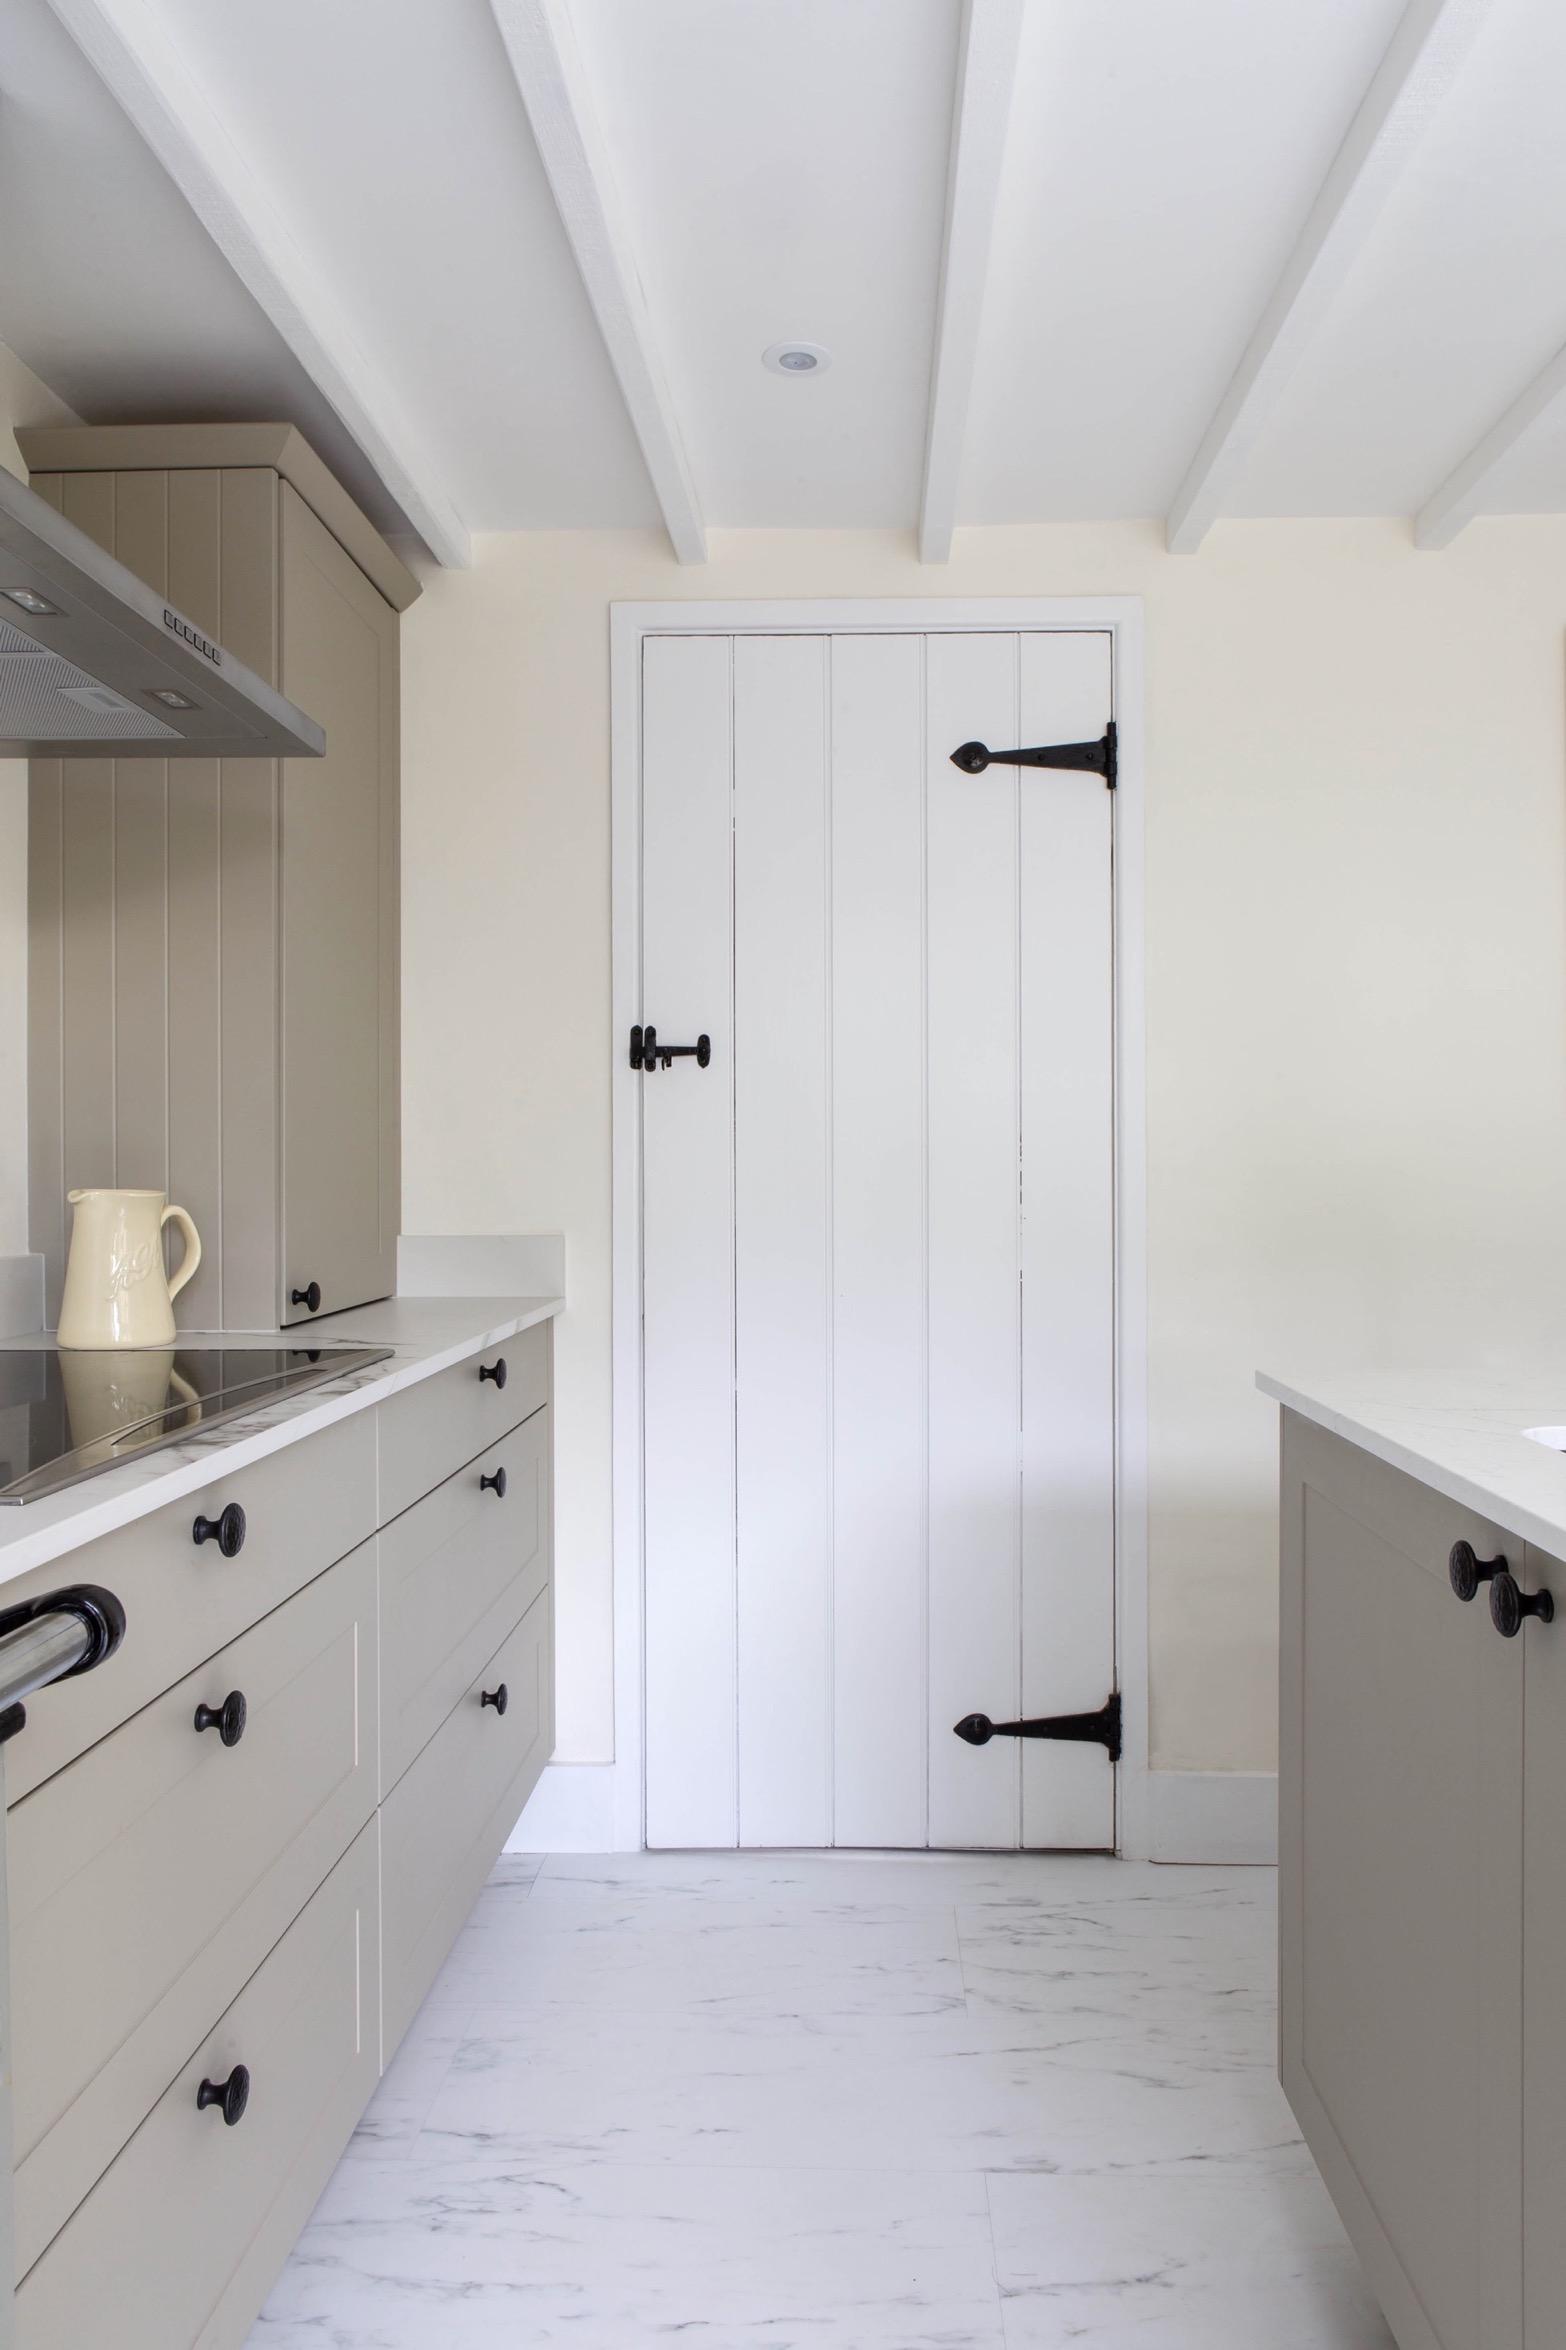 pan drawers induction hob worktop dresser worminghall oakley buckinghamshire 2 1